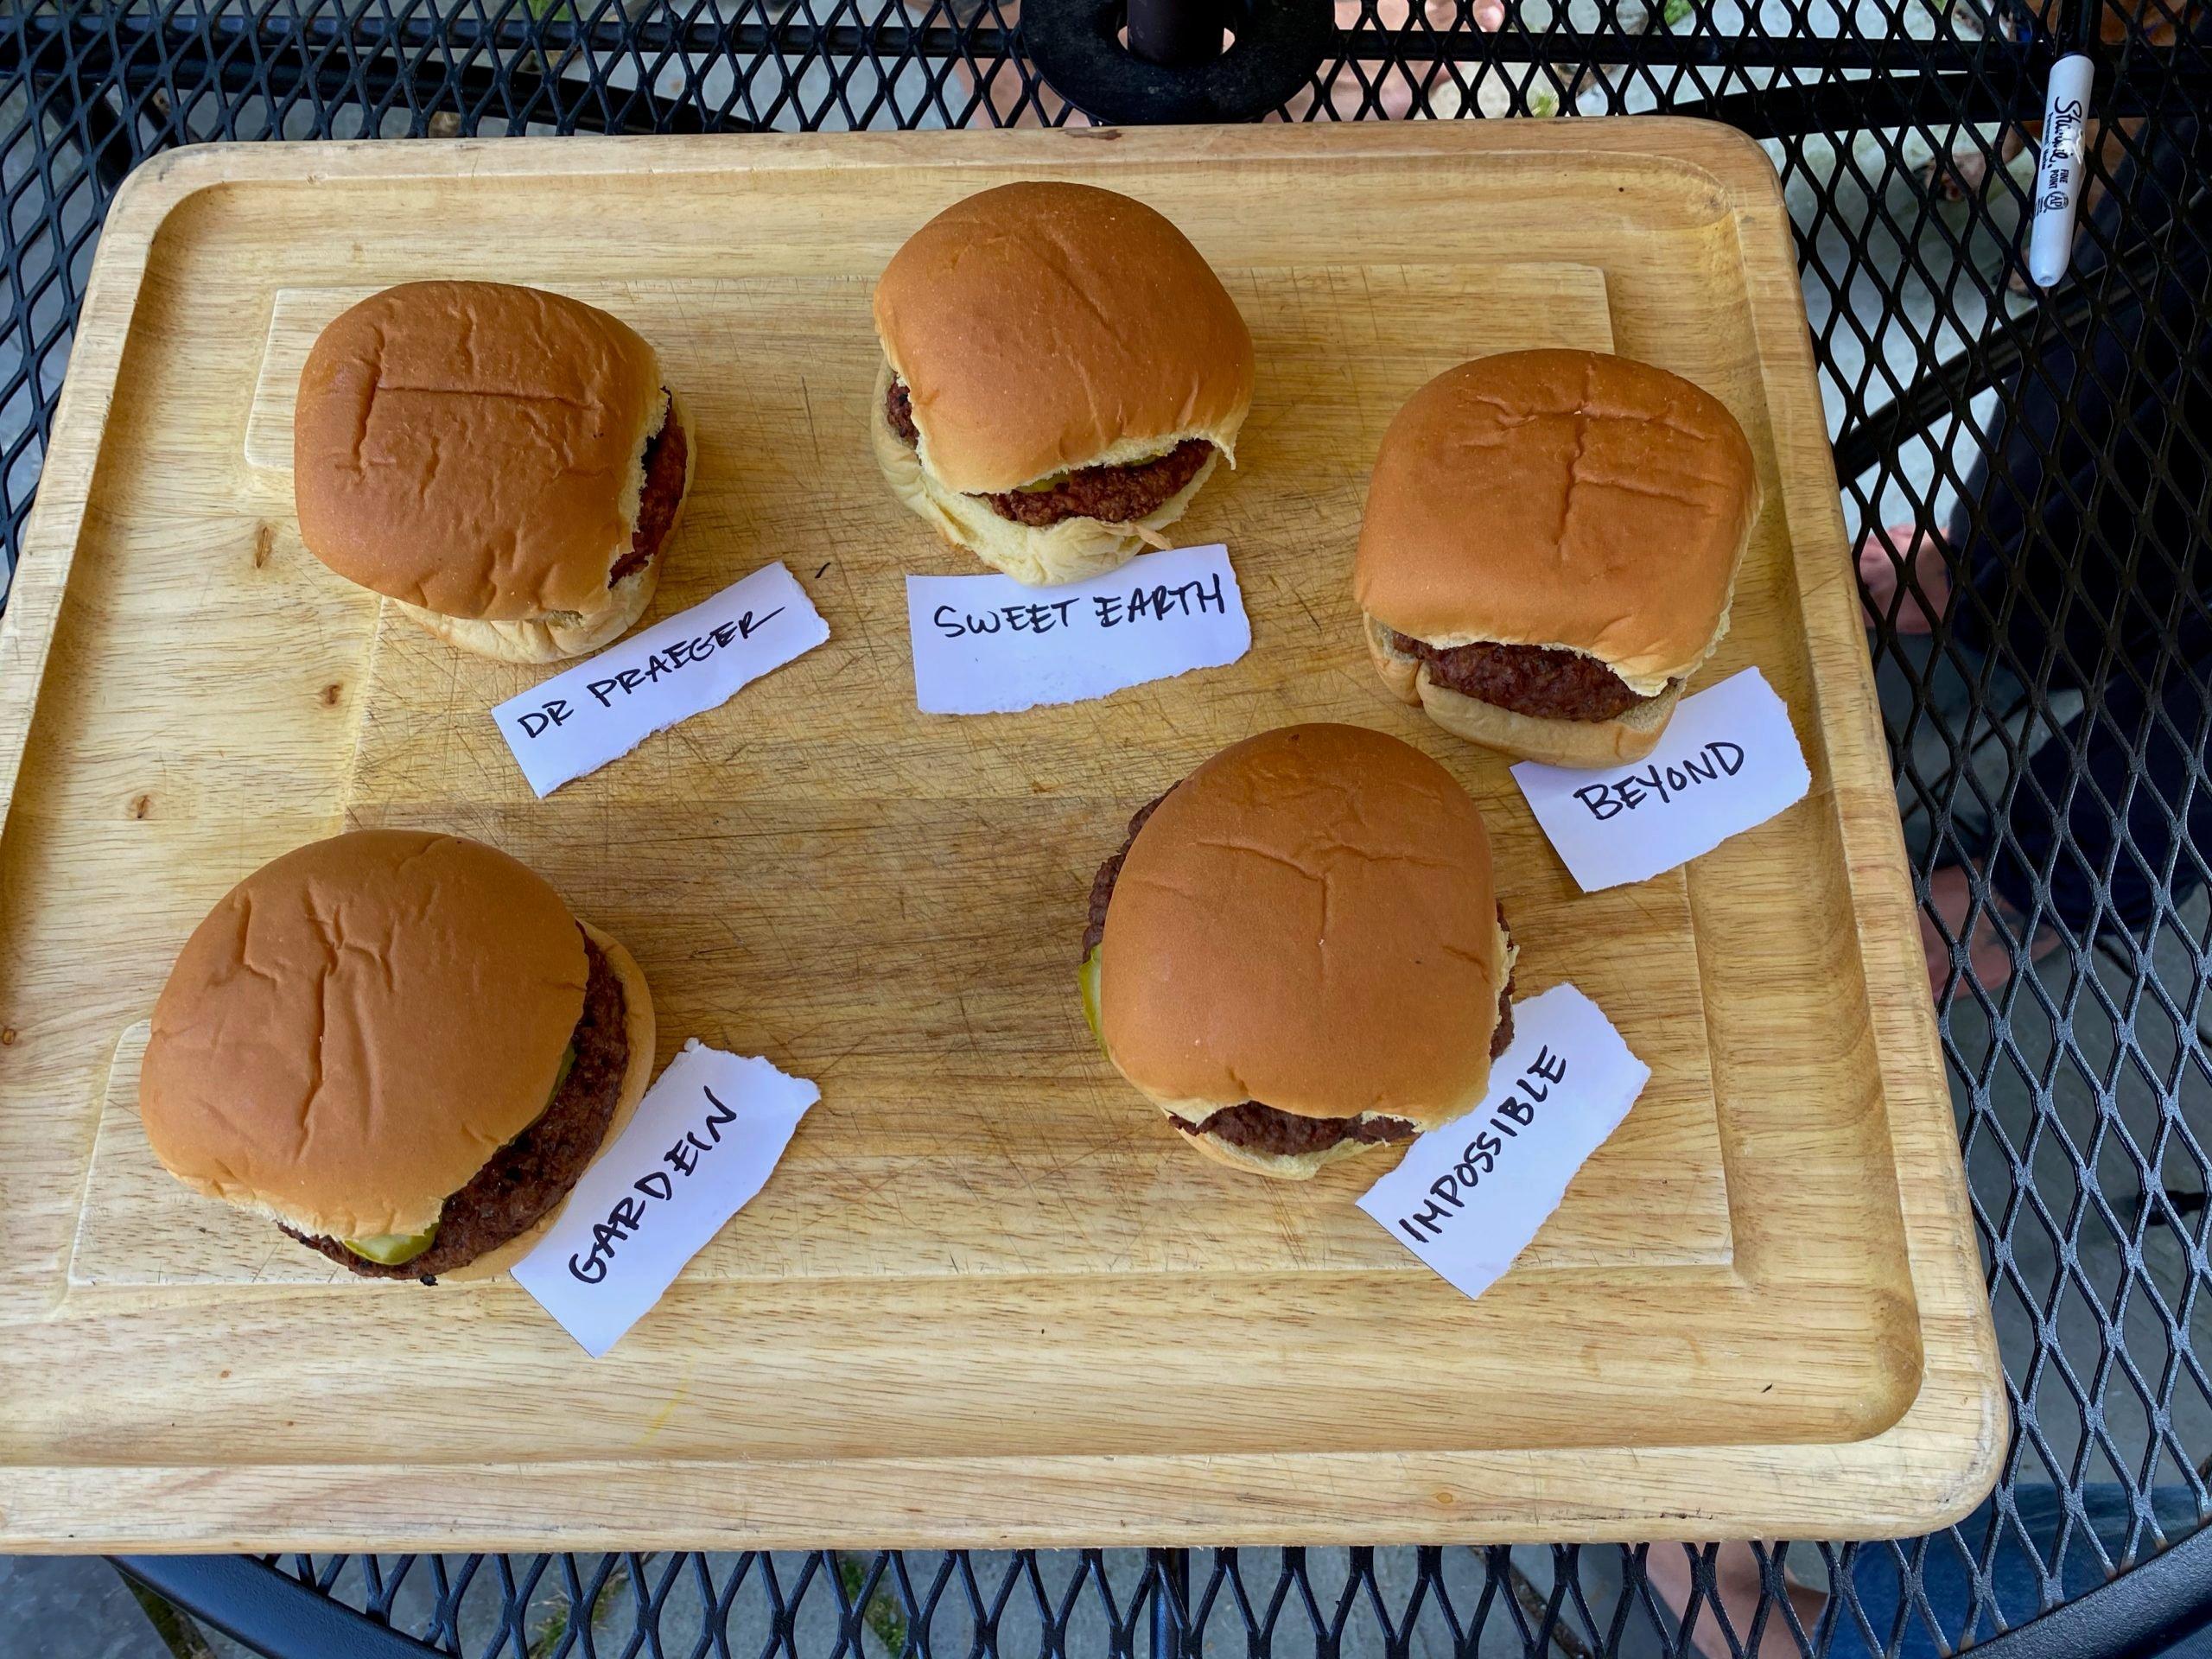 A Veggie Burger Taste Test